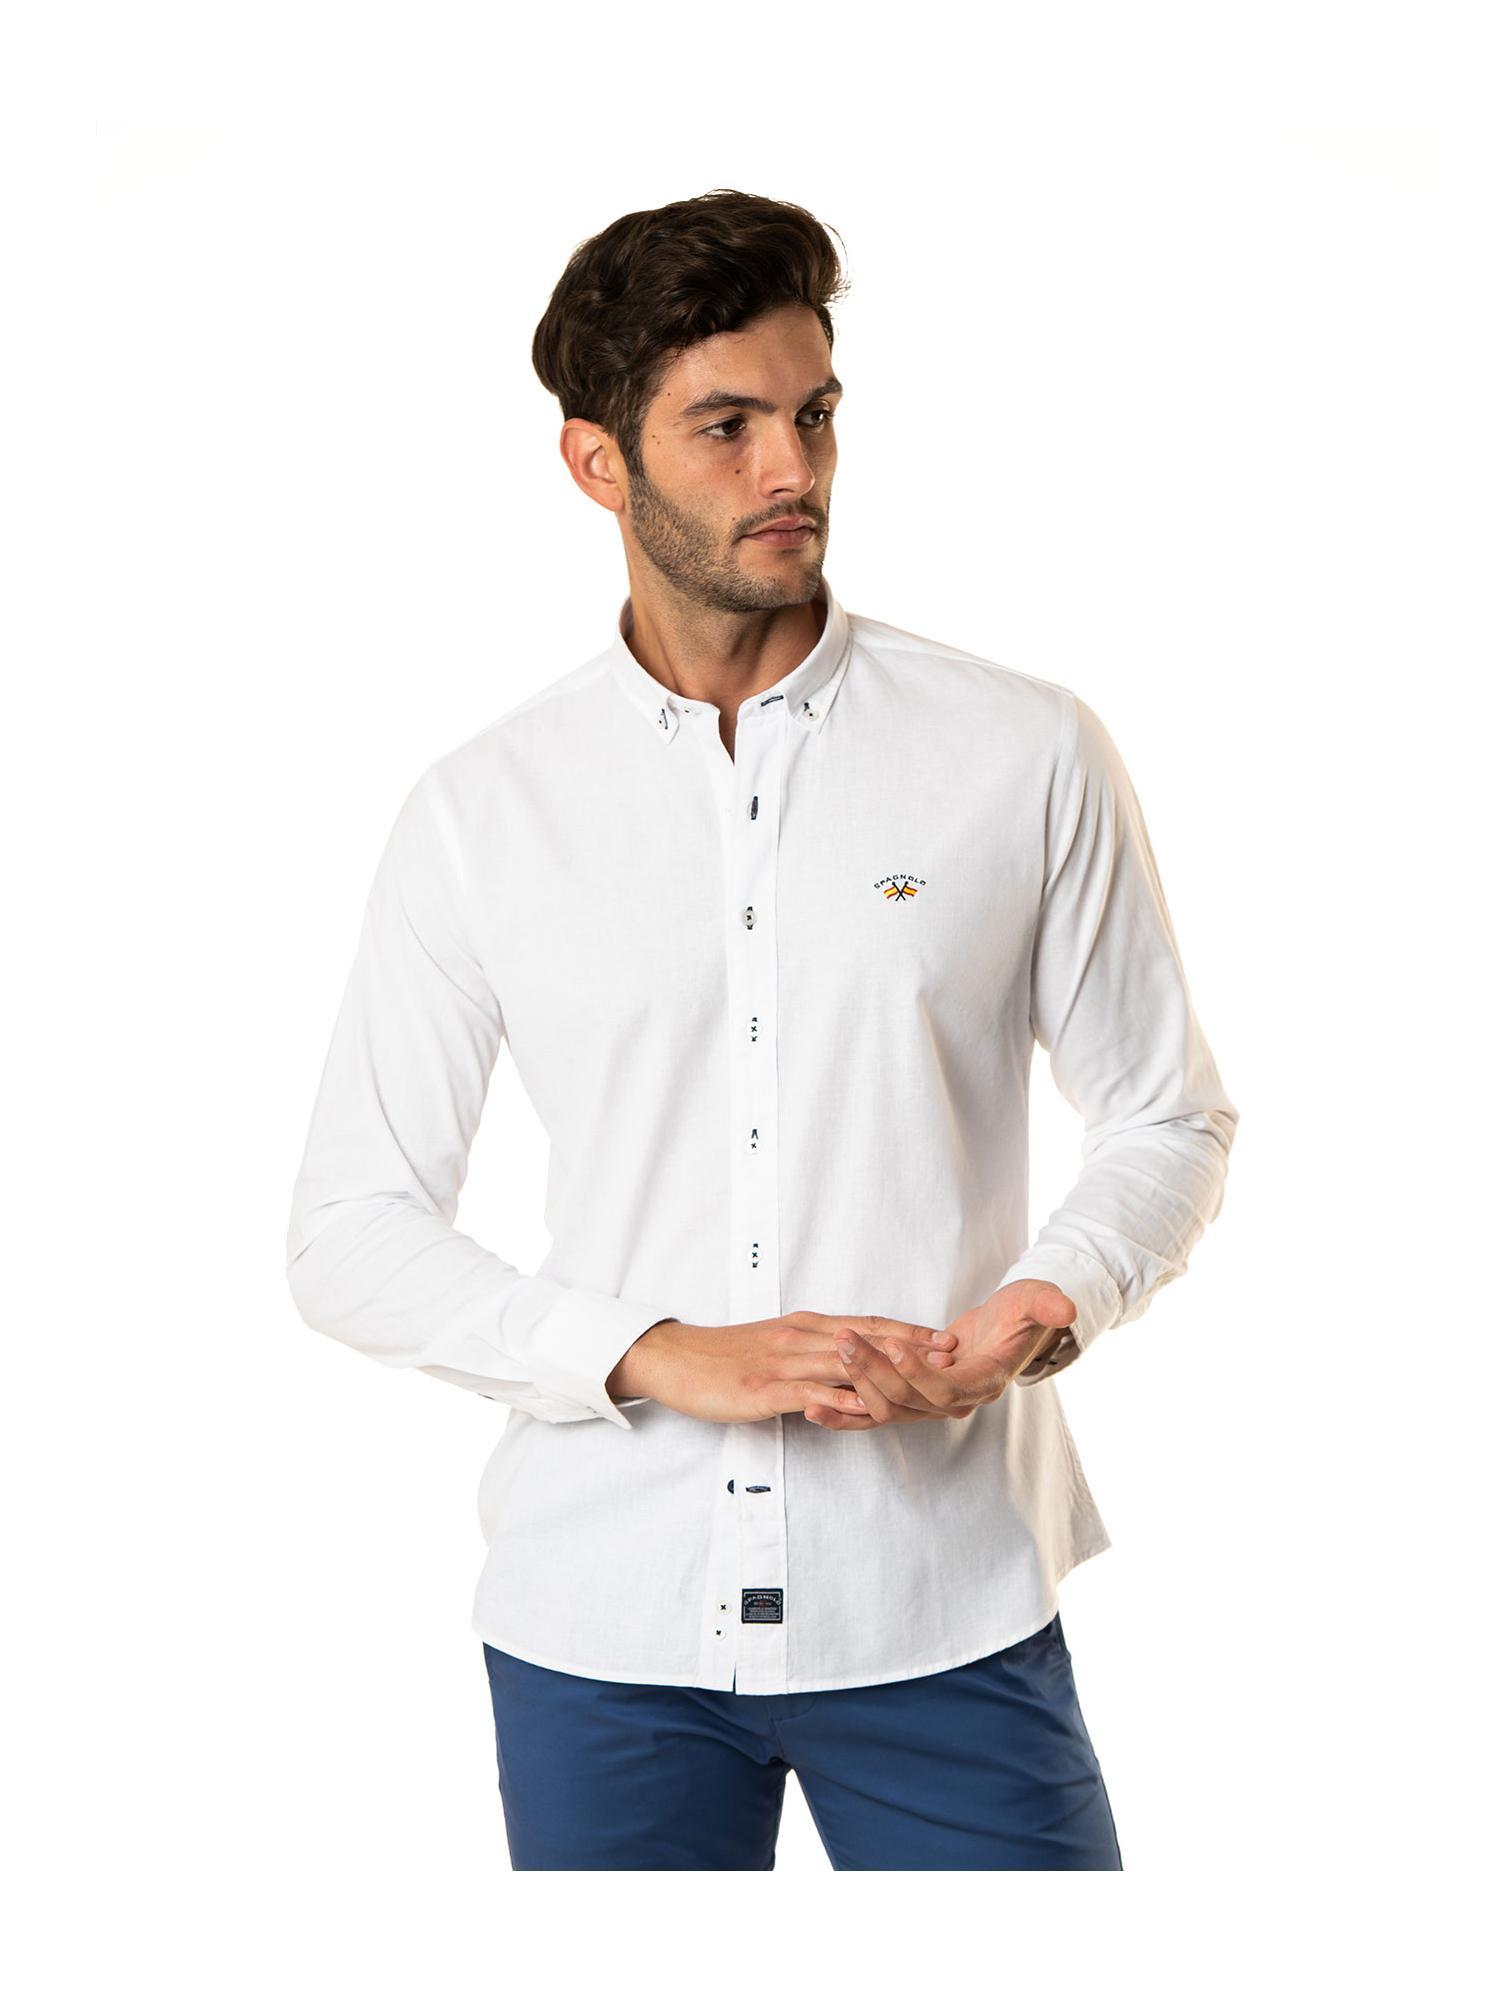 Camisa blanca tejido lino Spagnolo